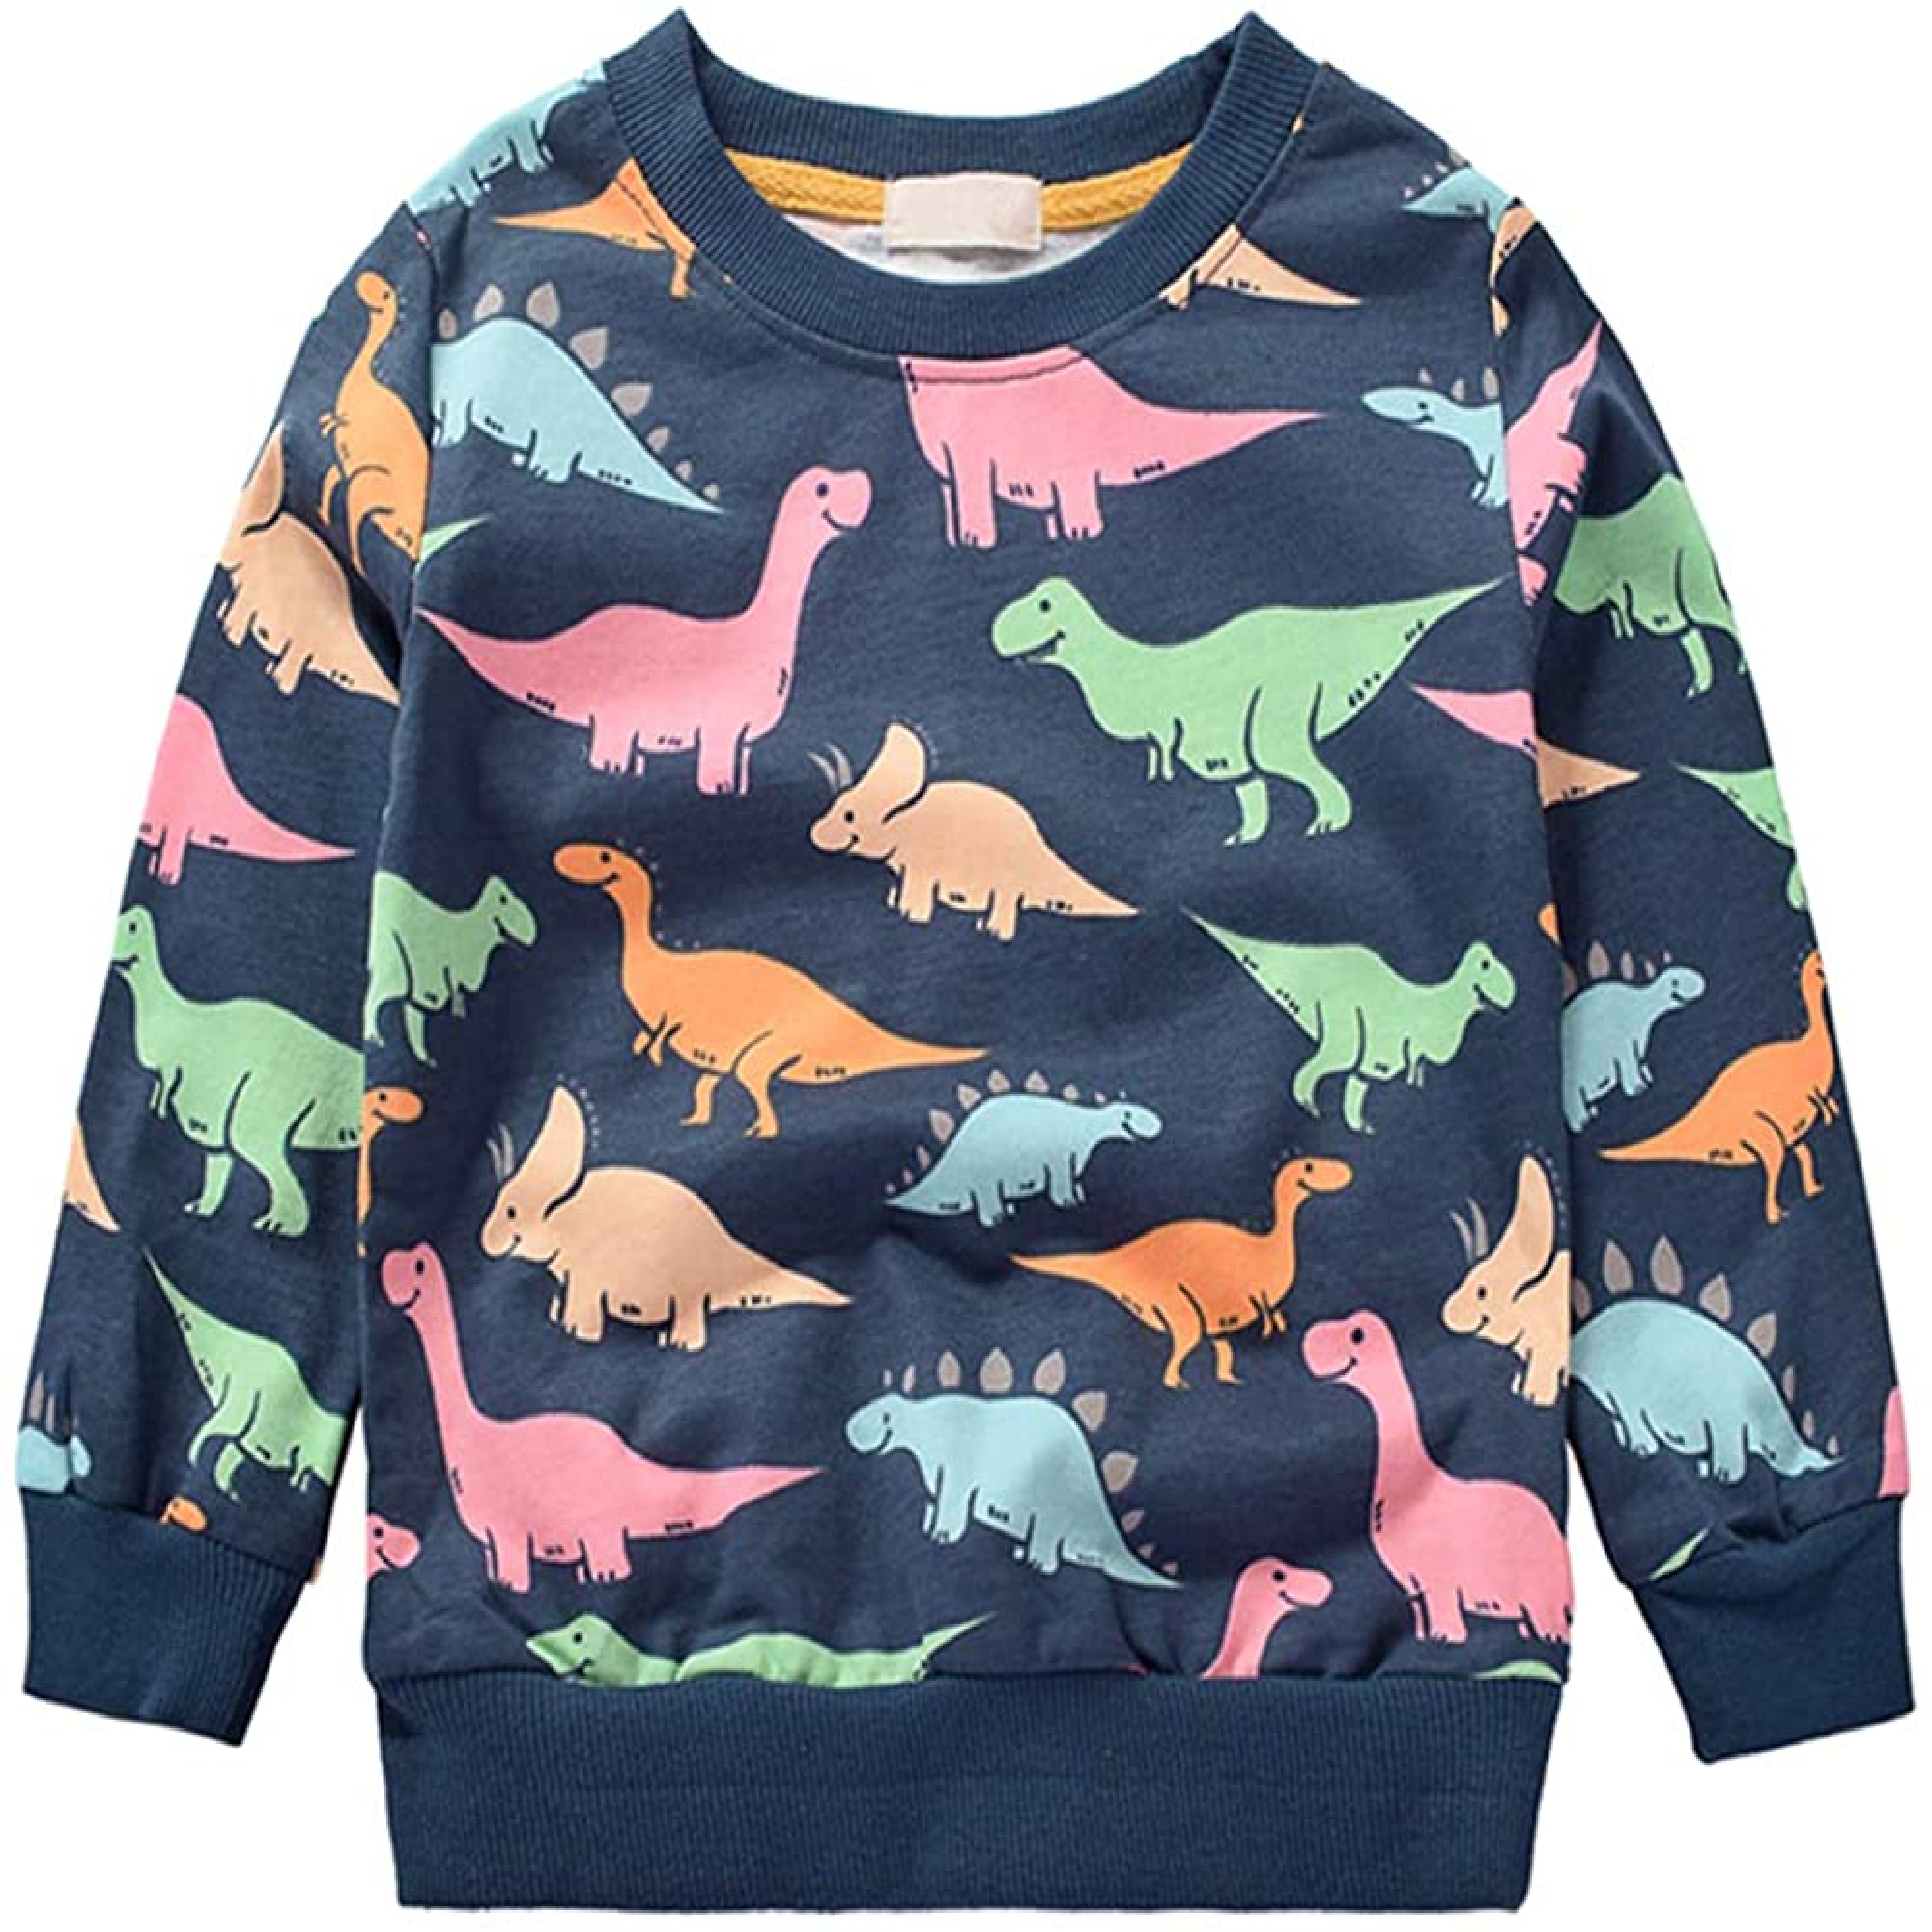 Toddler Boys Sweatshirts Long Sleeve Sport Elephant T Shirt Dinosaur Pullover Cartoon Tee Shirt for Kids